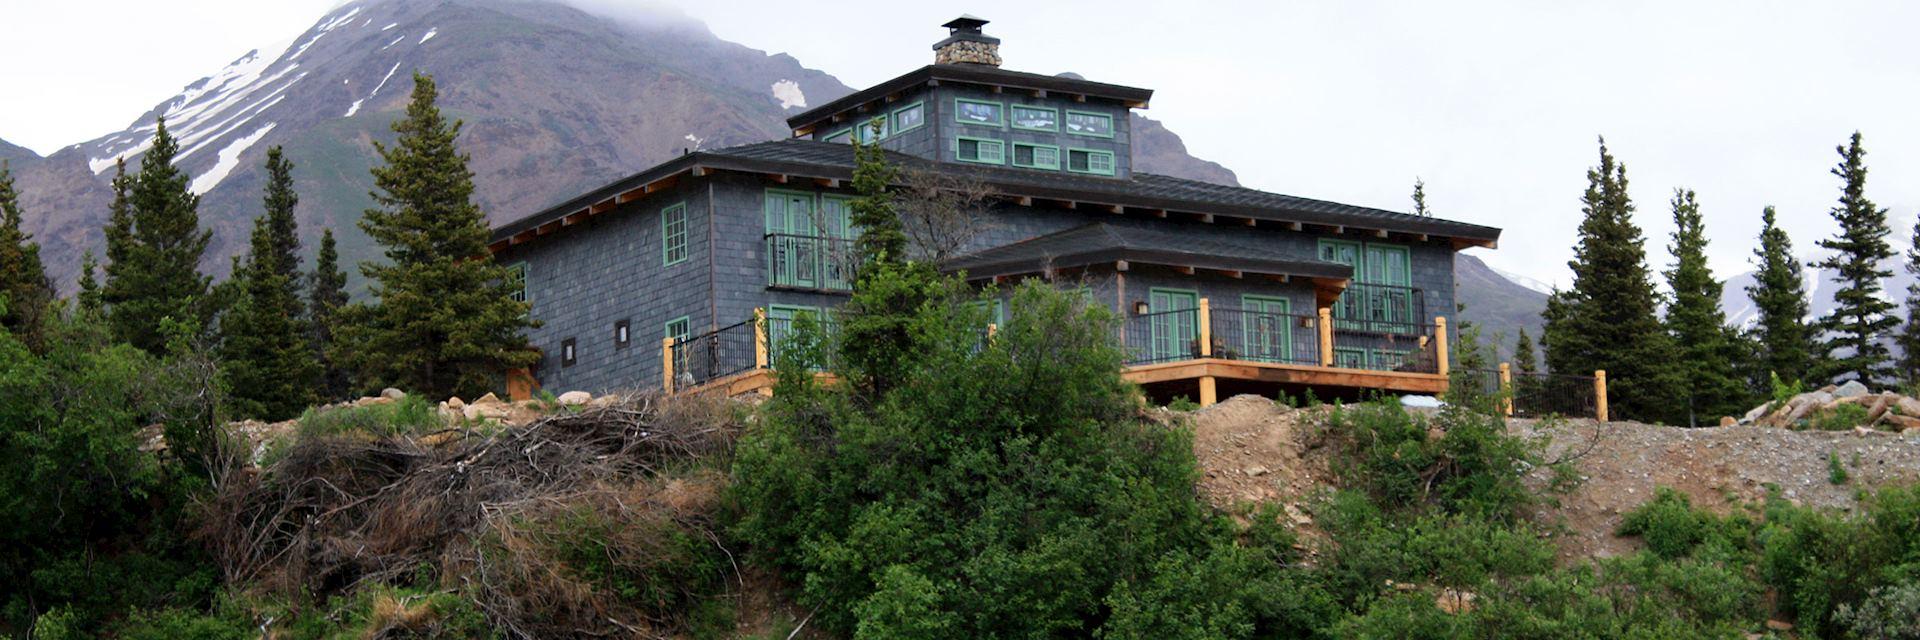 The Lodge at Black Rapids